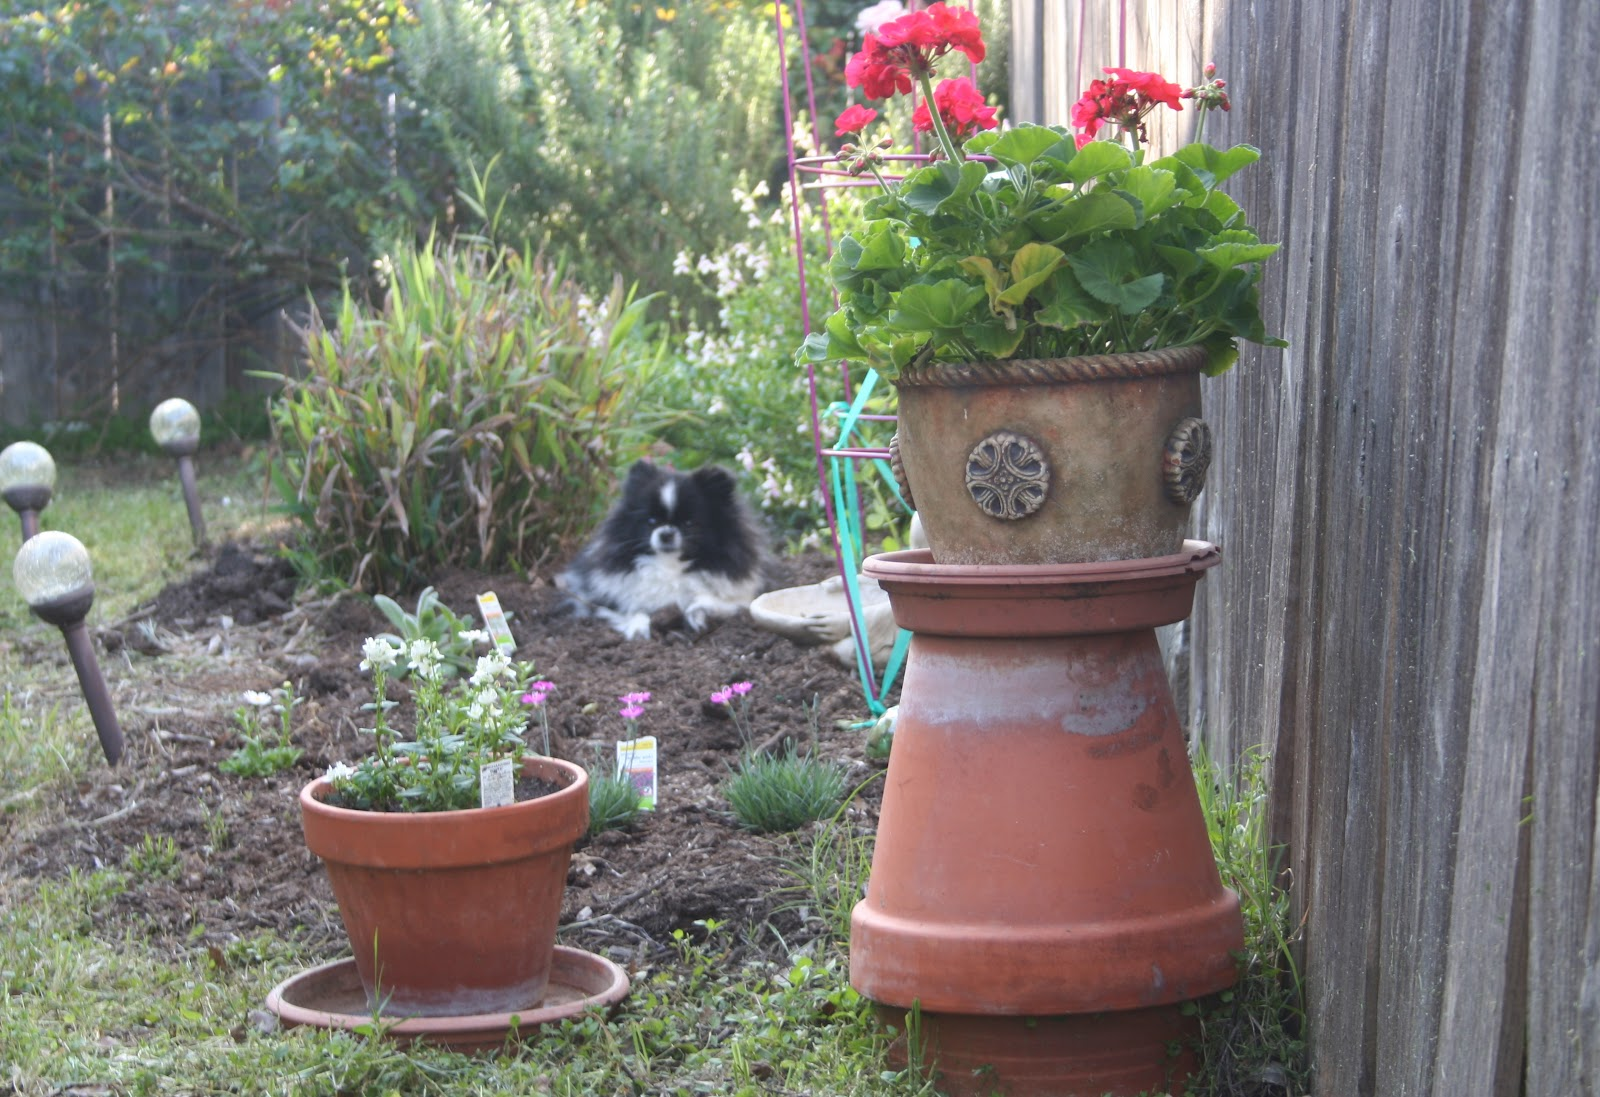 My Secret Garden: Misty Poe: My Little Secret Garden